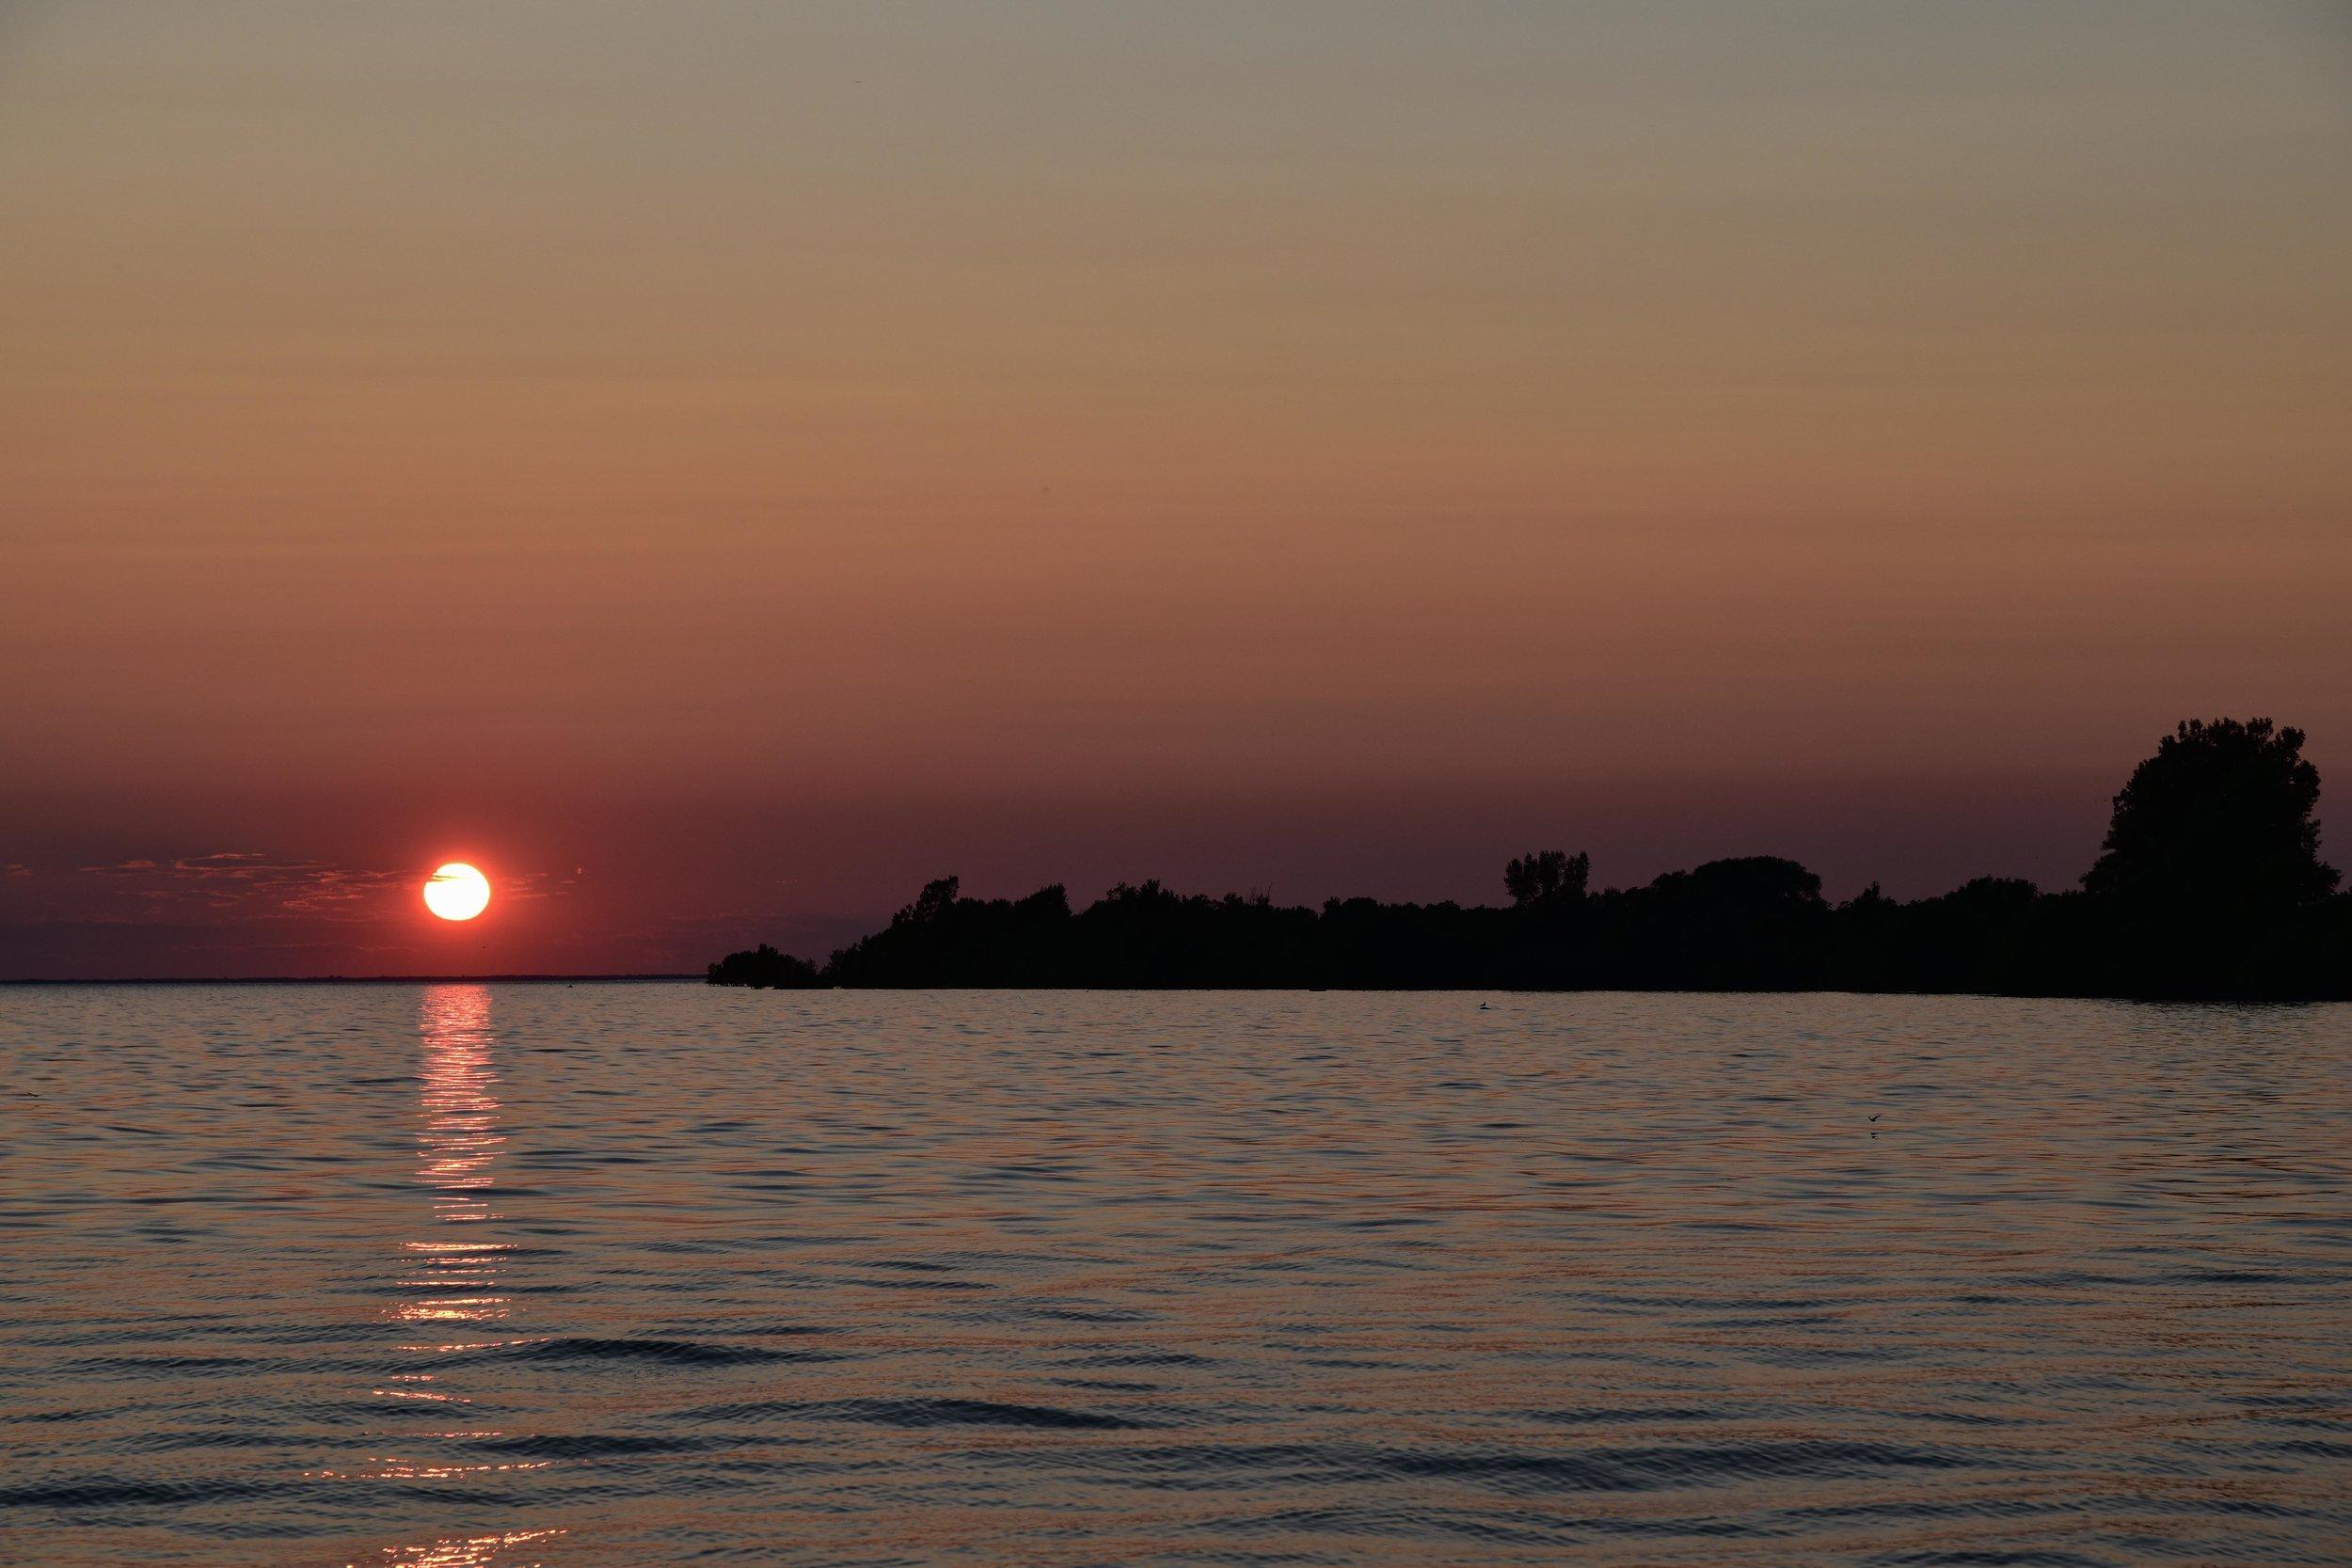 Duck Island Sunset, Duck Island, Lake Ontario